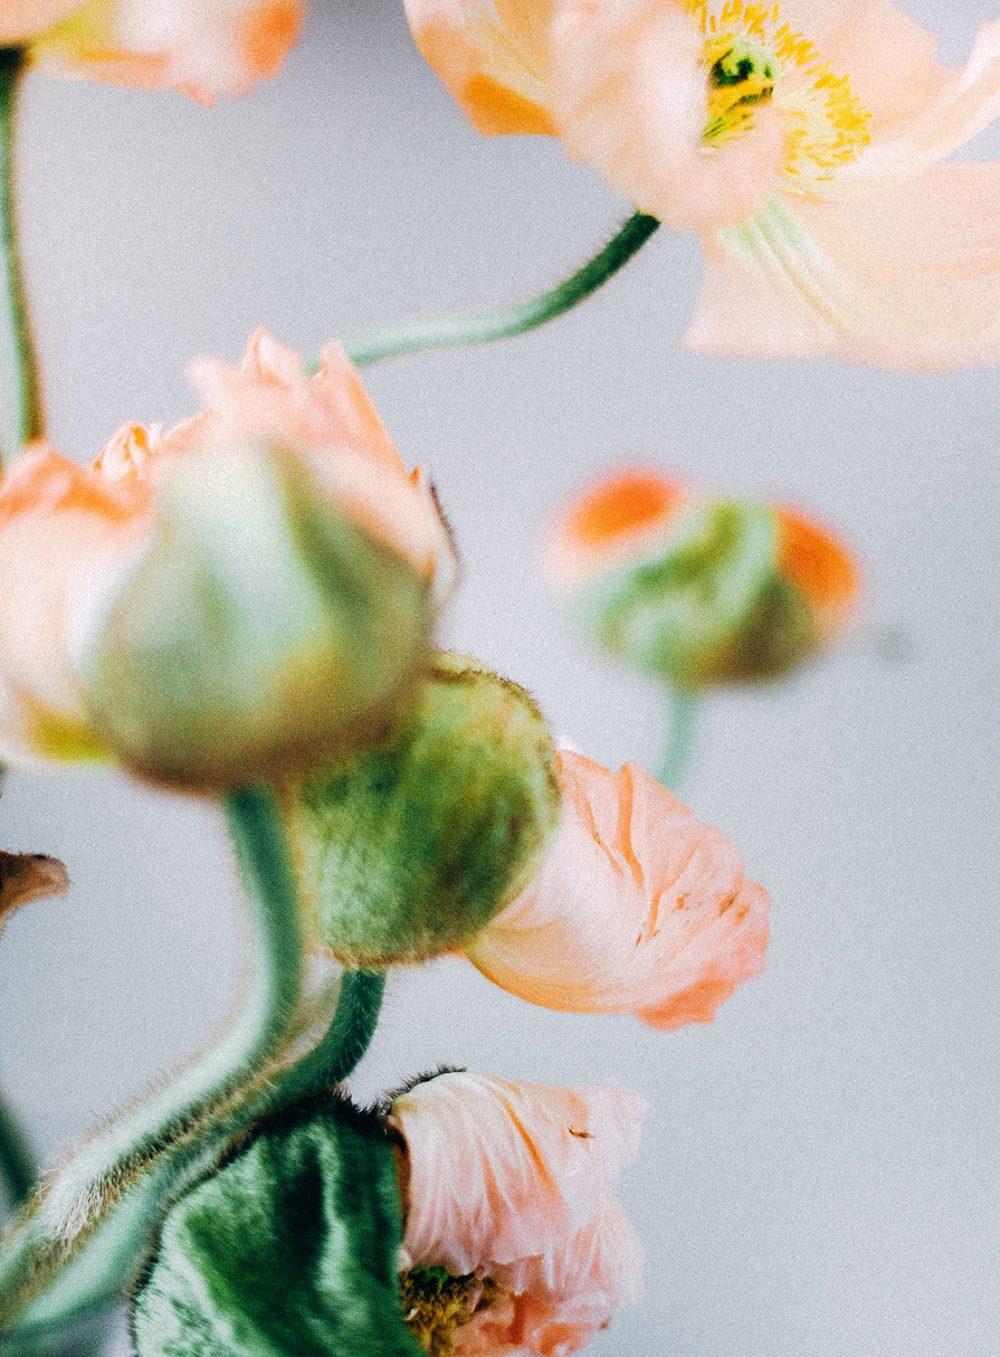 Blumendetail Mohn Apricot Peach Orange Hochzeitsdekoration Fine Art Photography Tabea Maria-Lisa